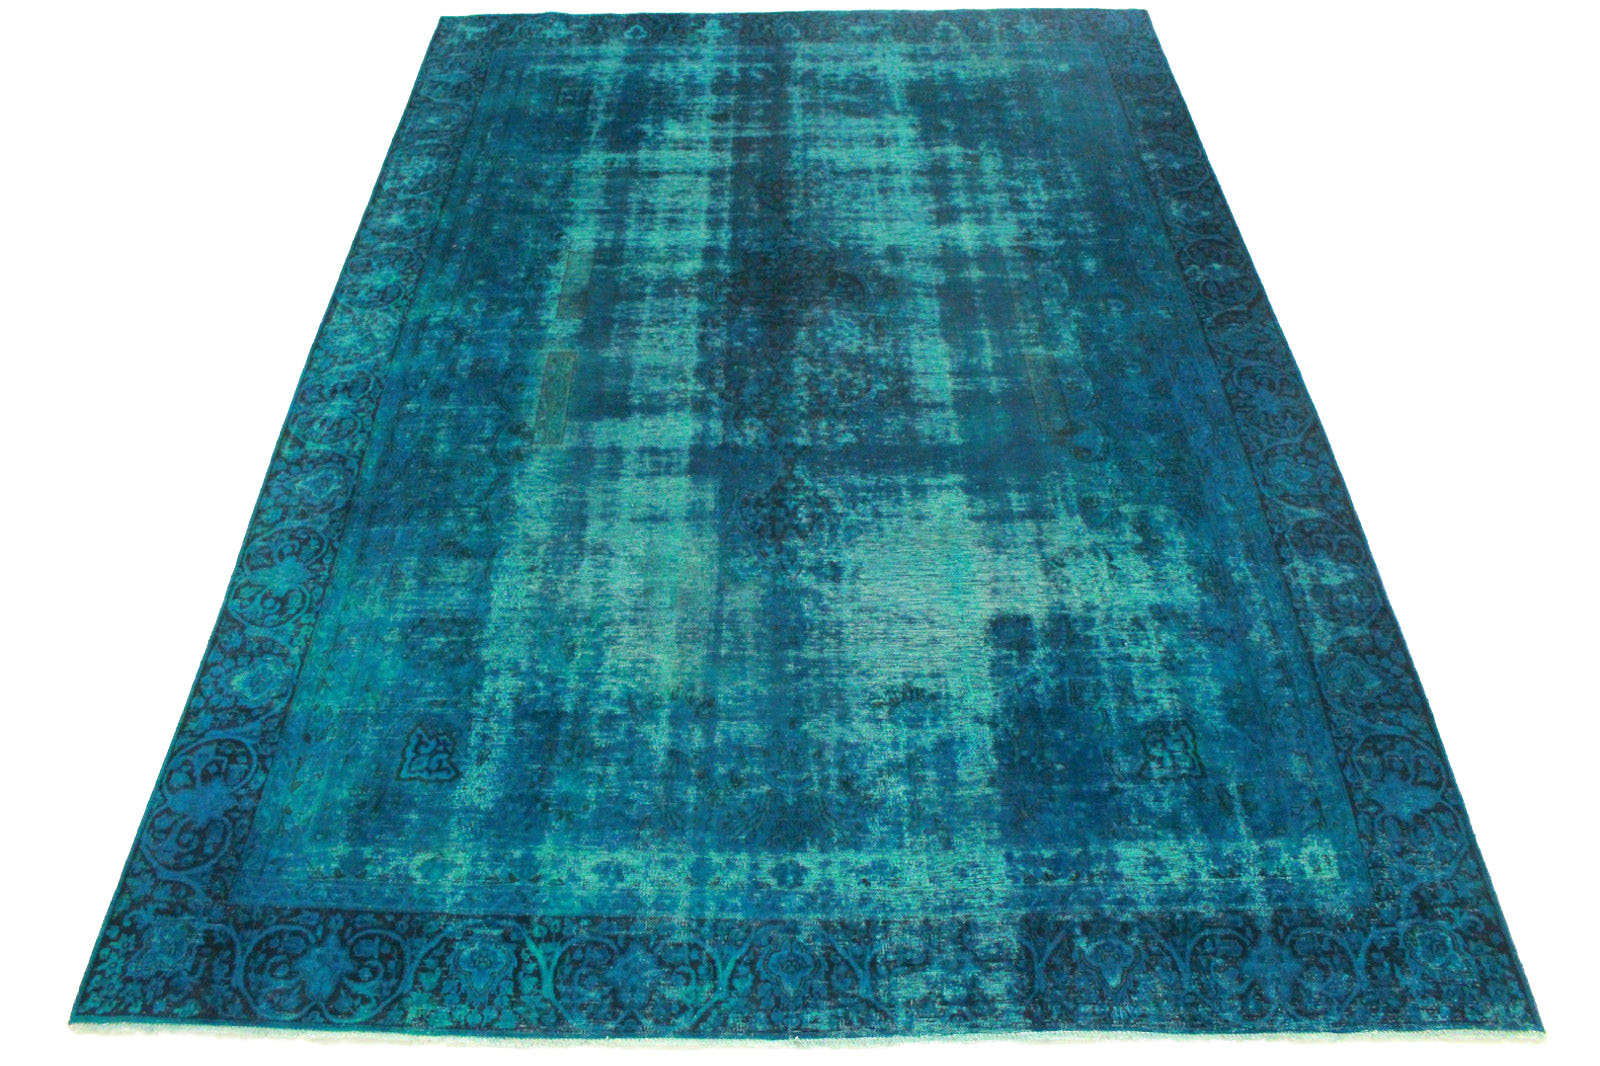 vintage teppich t rkis in 410x280cm 1001 3262 bei kaufen. Black Bedroom Furniture Sets. Home Design Ideas